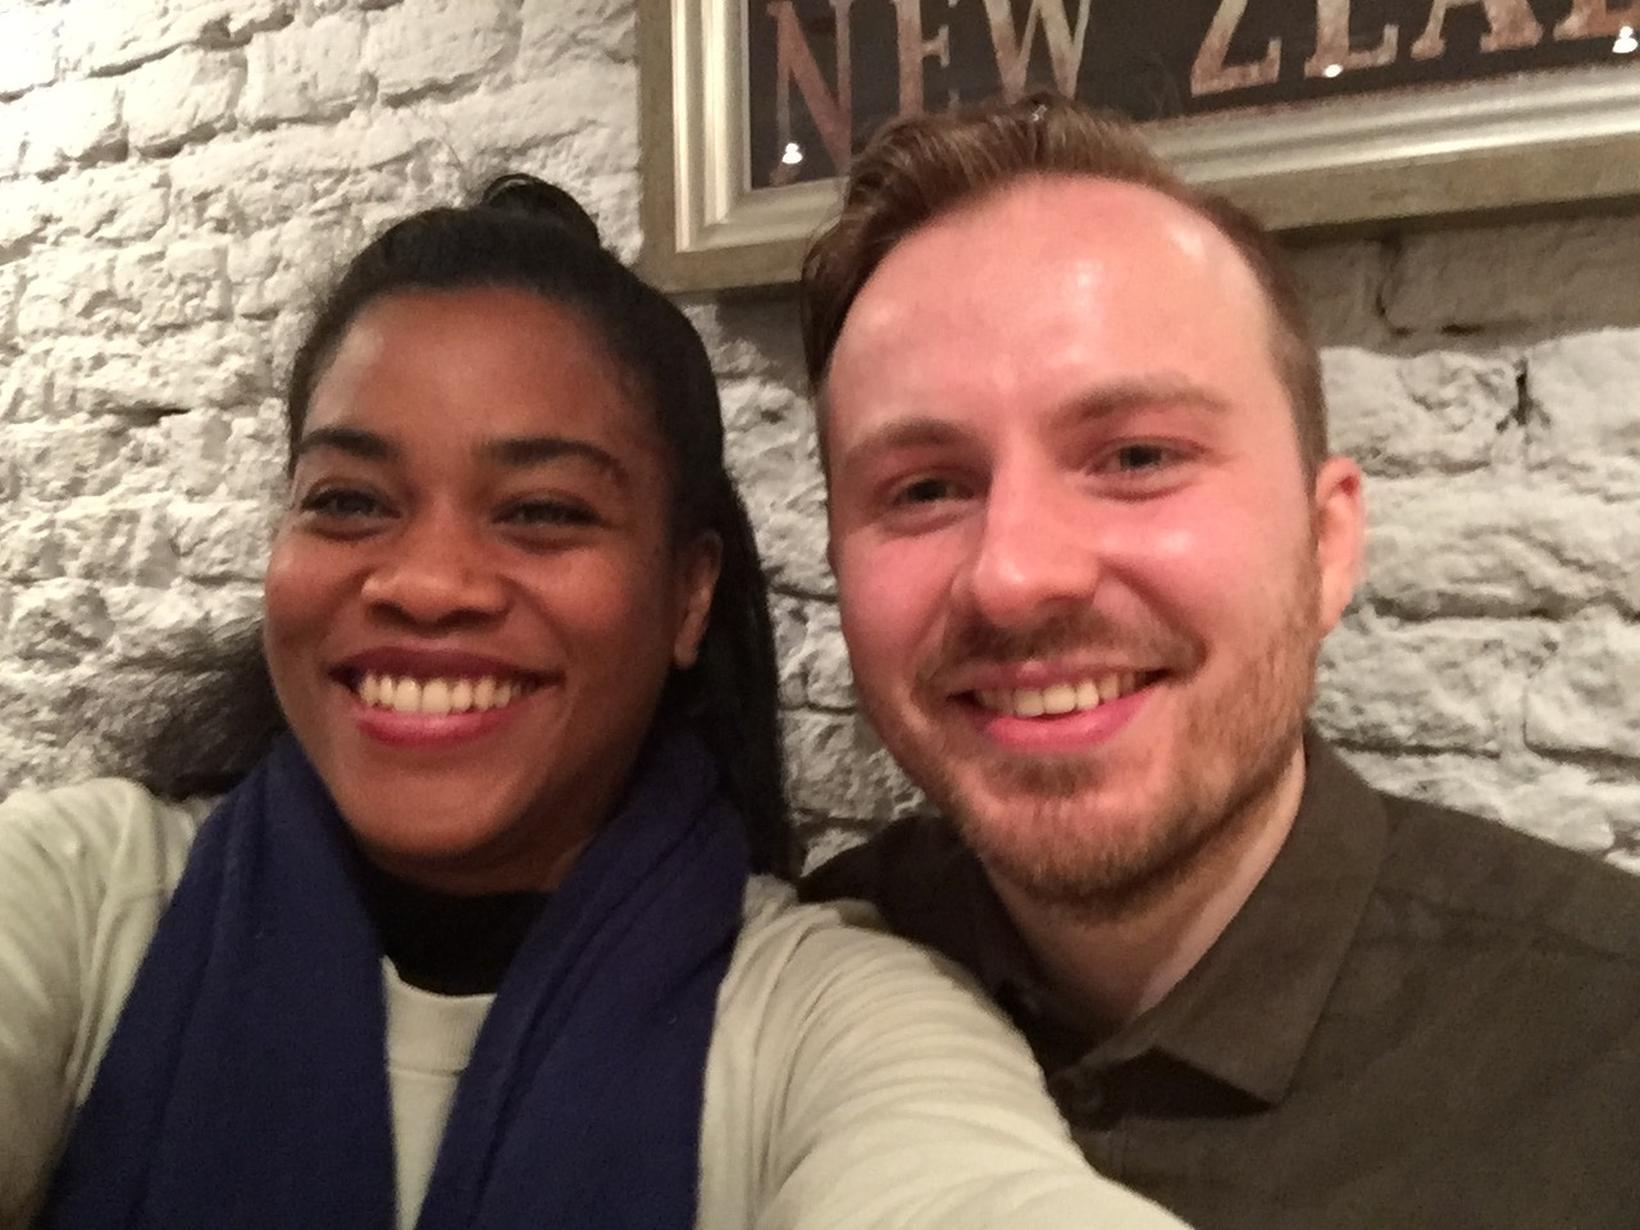 Daniel & Julia-beth from Amsterdam, Netherlands